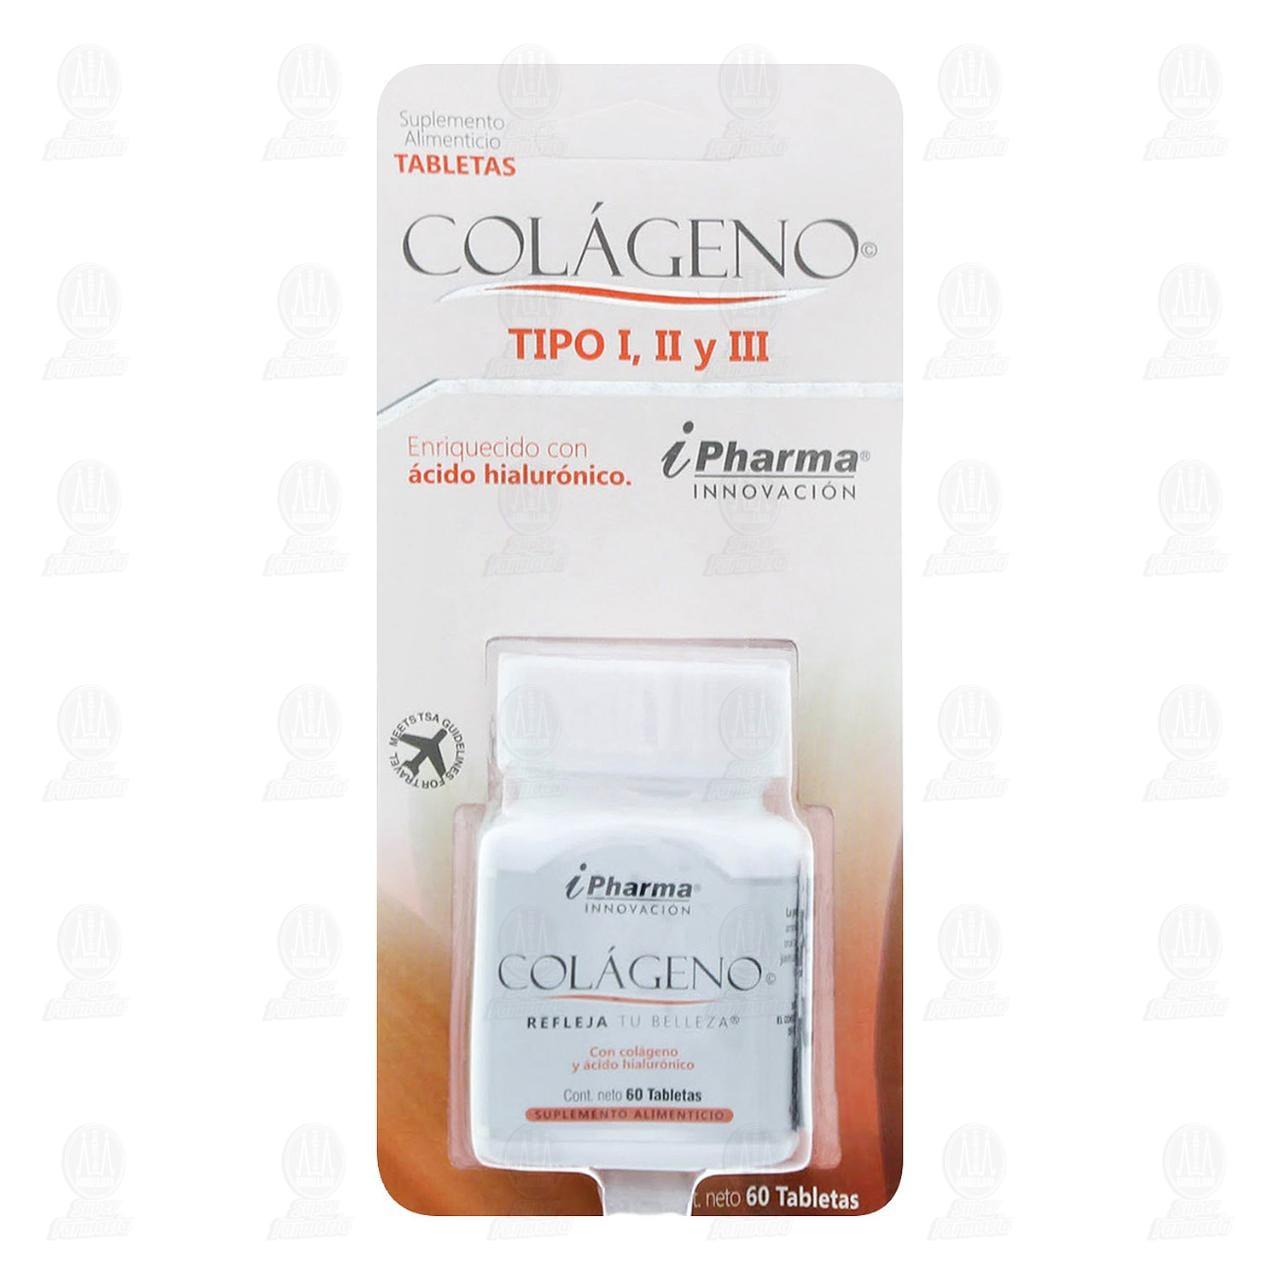 comprar https://www.movil.farmaciasguadalajara.com/wcsstore/FGCAS/wcs/products/1155156_S_1280_F.jpg en farmacias guadalajara